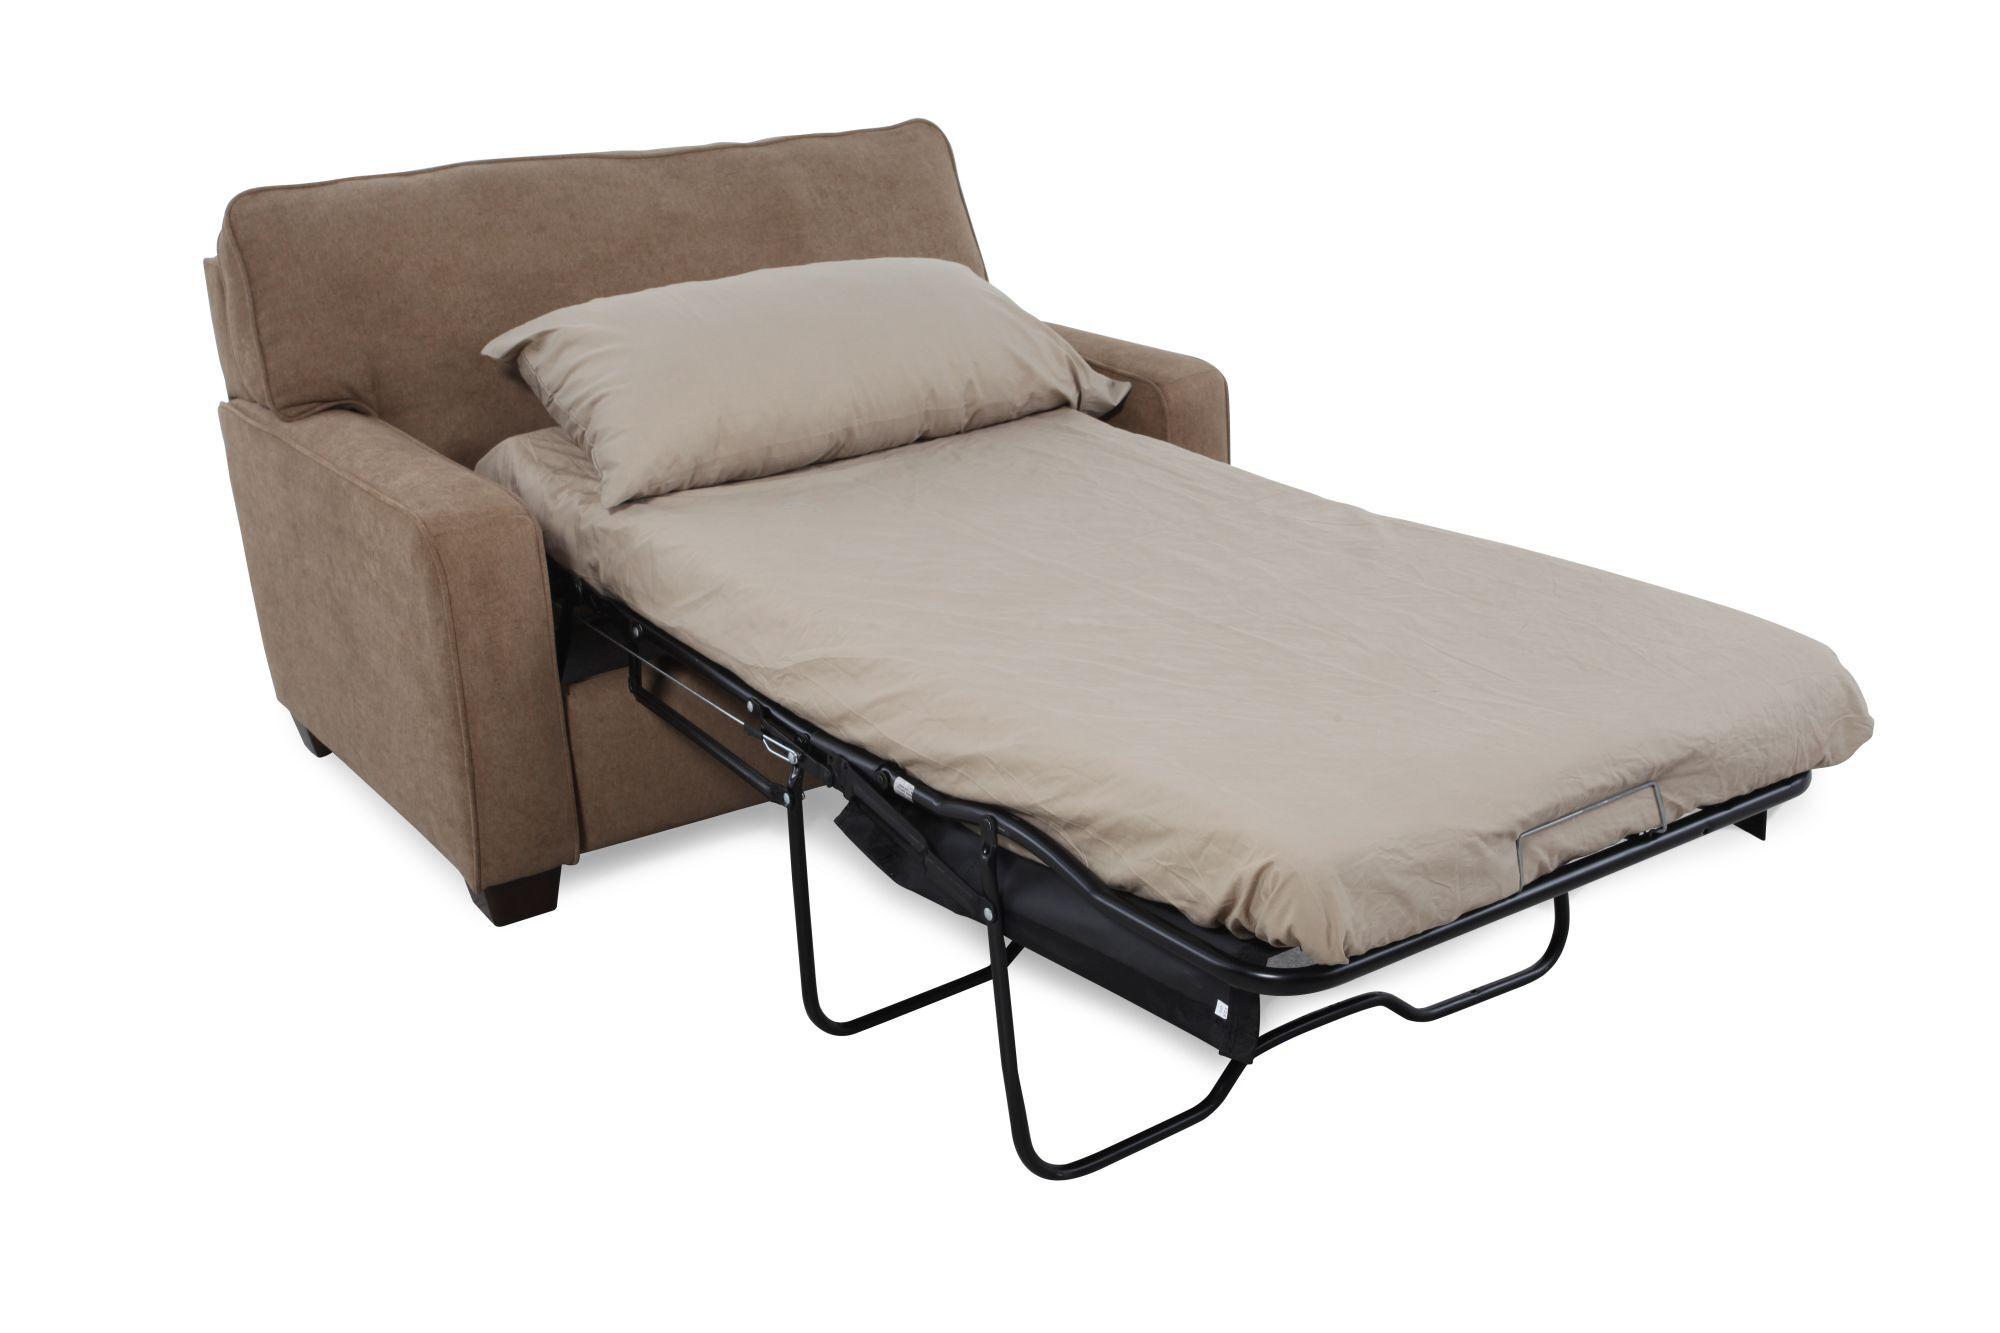 ... I Rest Casual 54u0026quot; Sleeper Chair ...